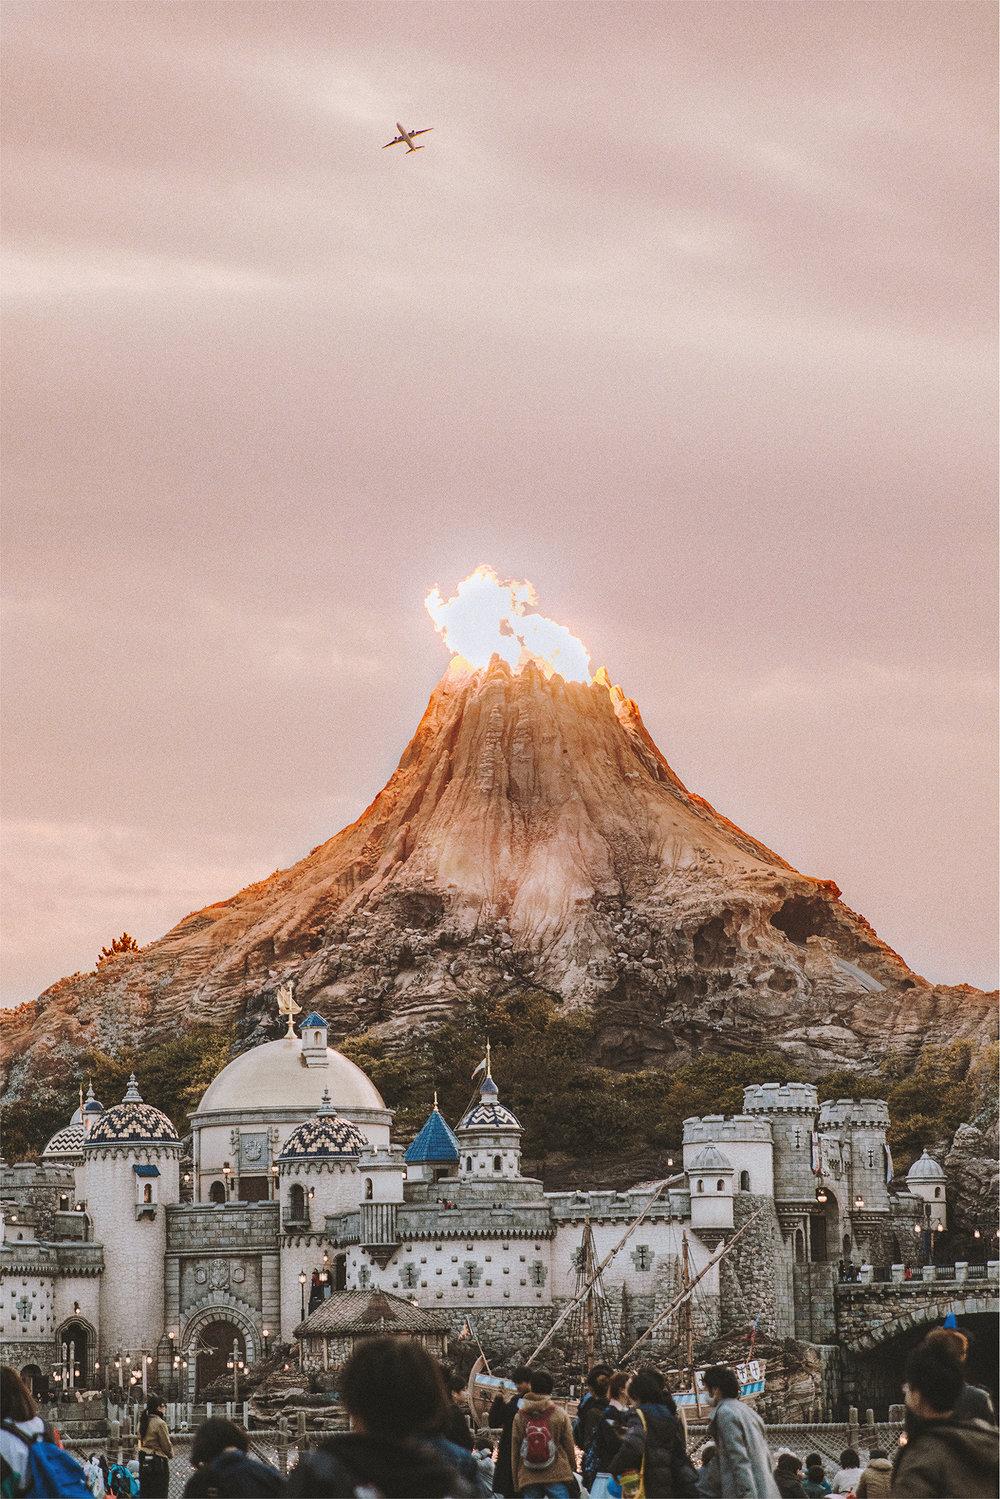 Look at Mount Prometheus erupt! This stunning display really brings DisneySea to life.